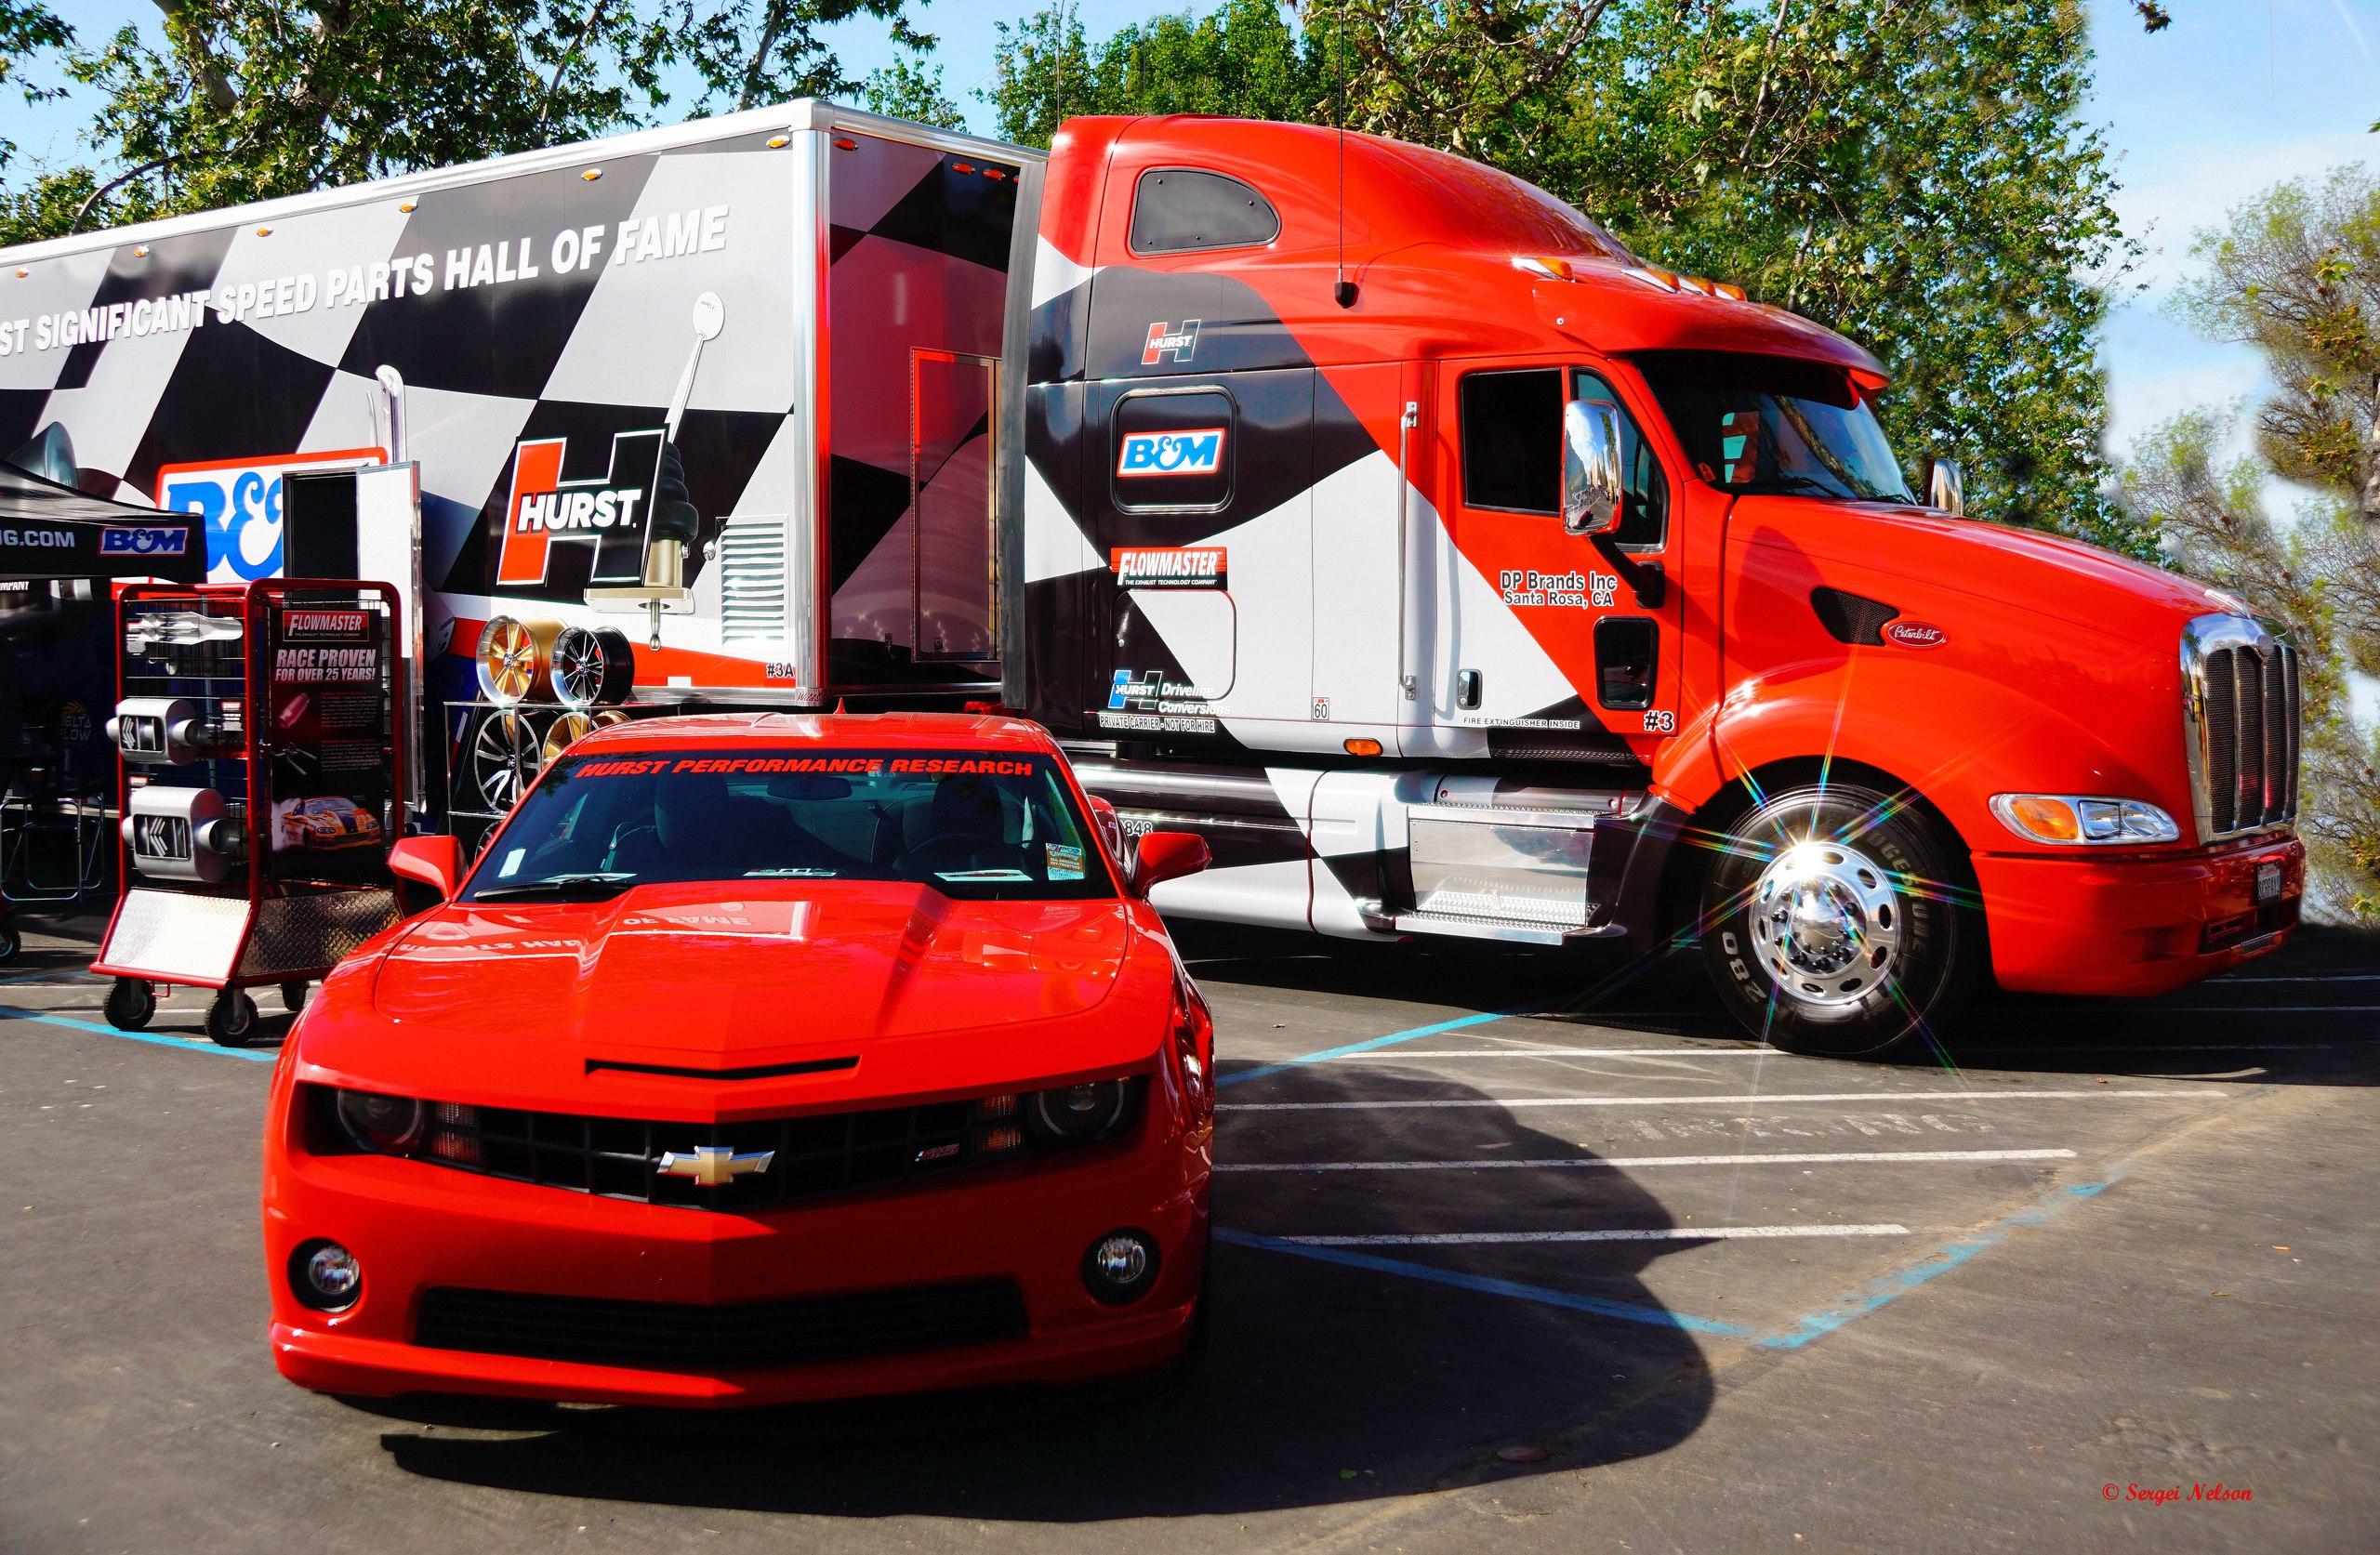 форд мустанг и грузовик красного цвета